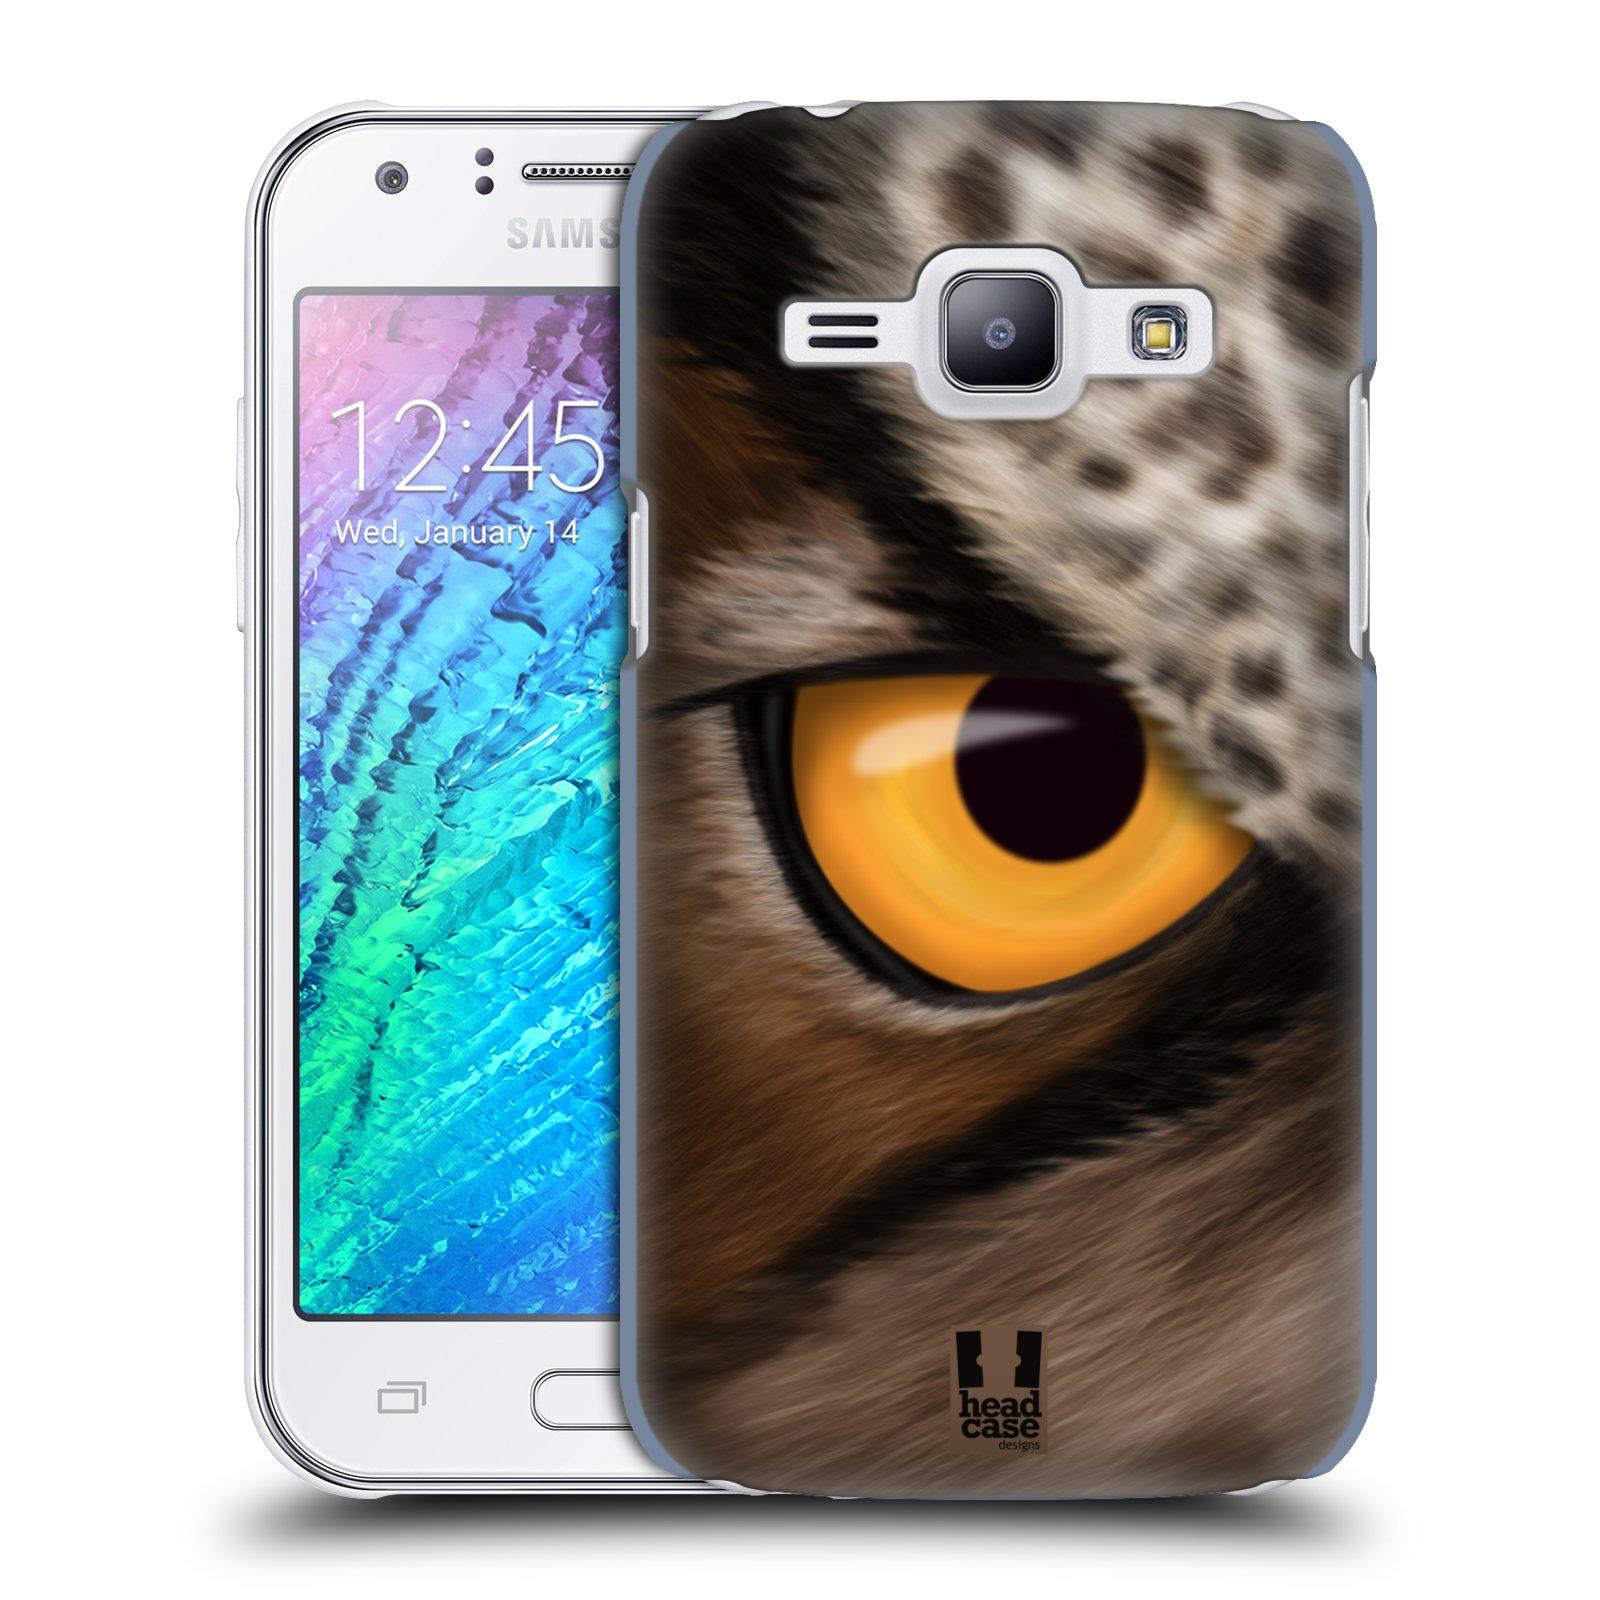 HEAD CASE plastový obal na mobil SAMSUNG Galaxy J1, J100 vzor pohled zvířete oko sova